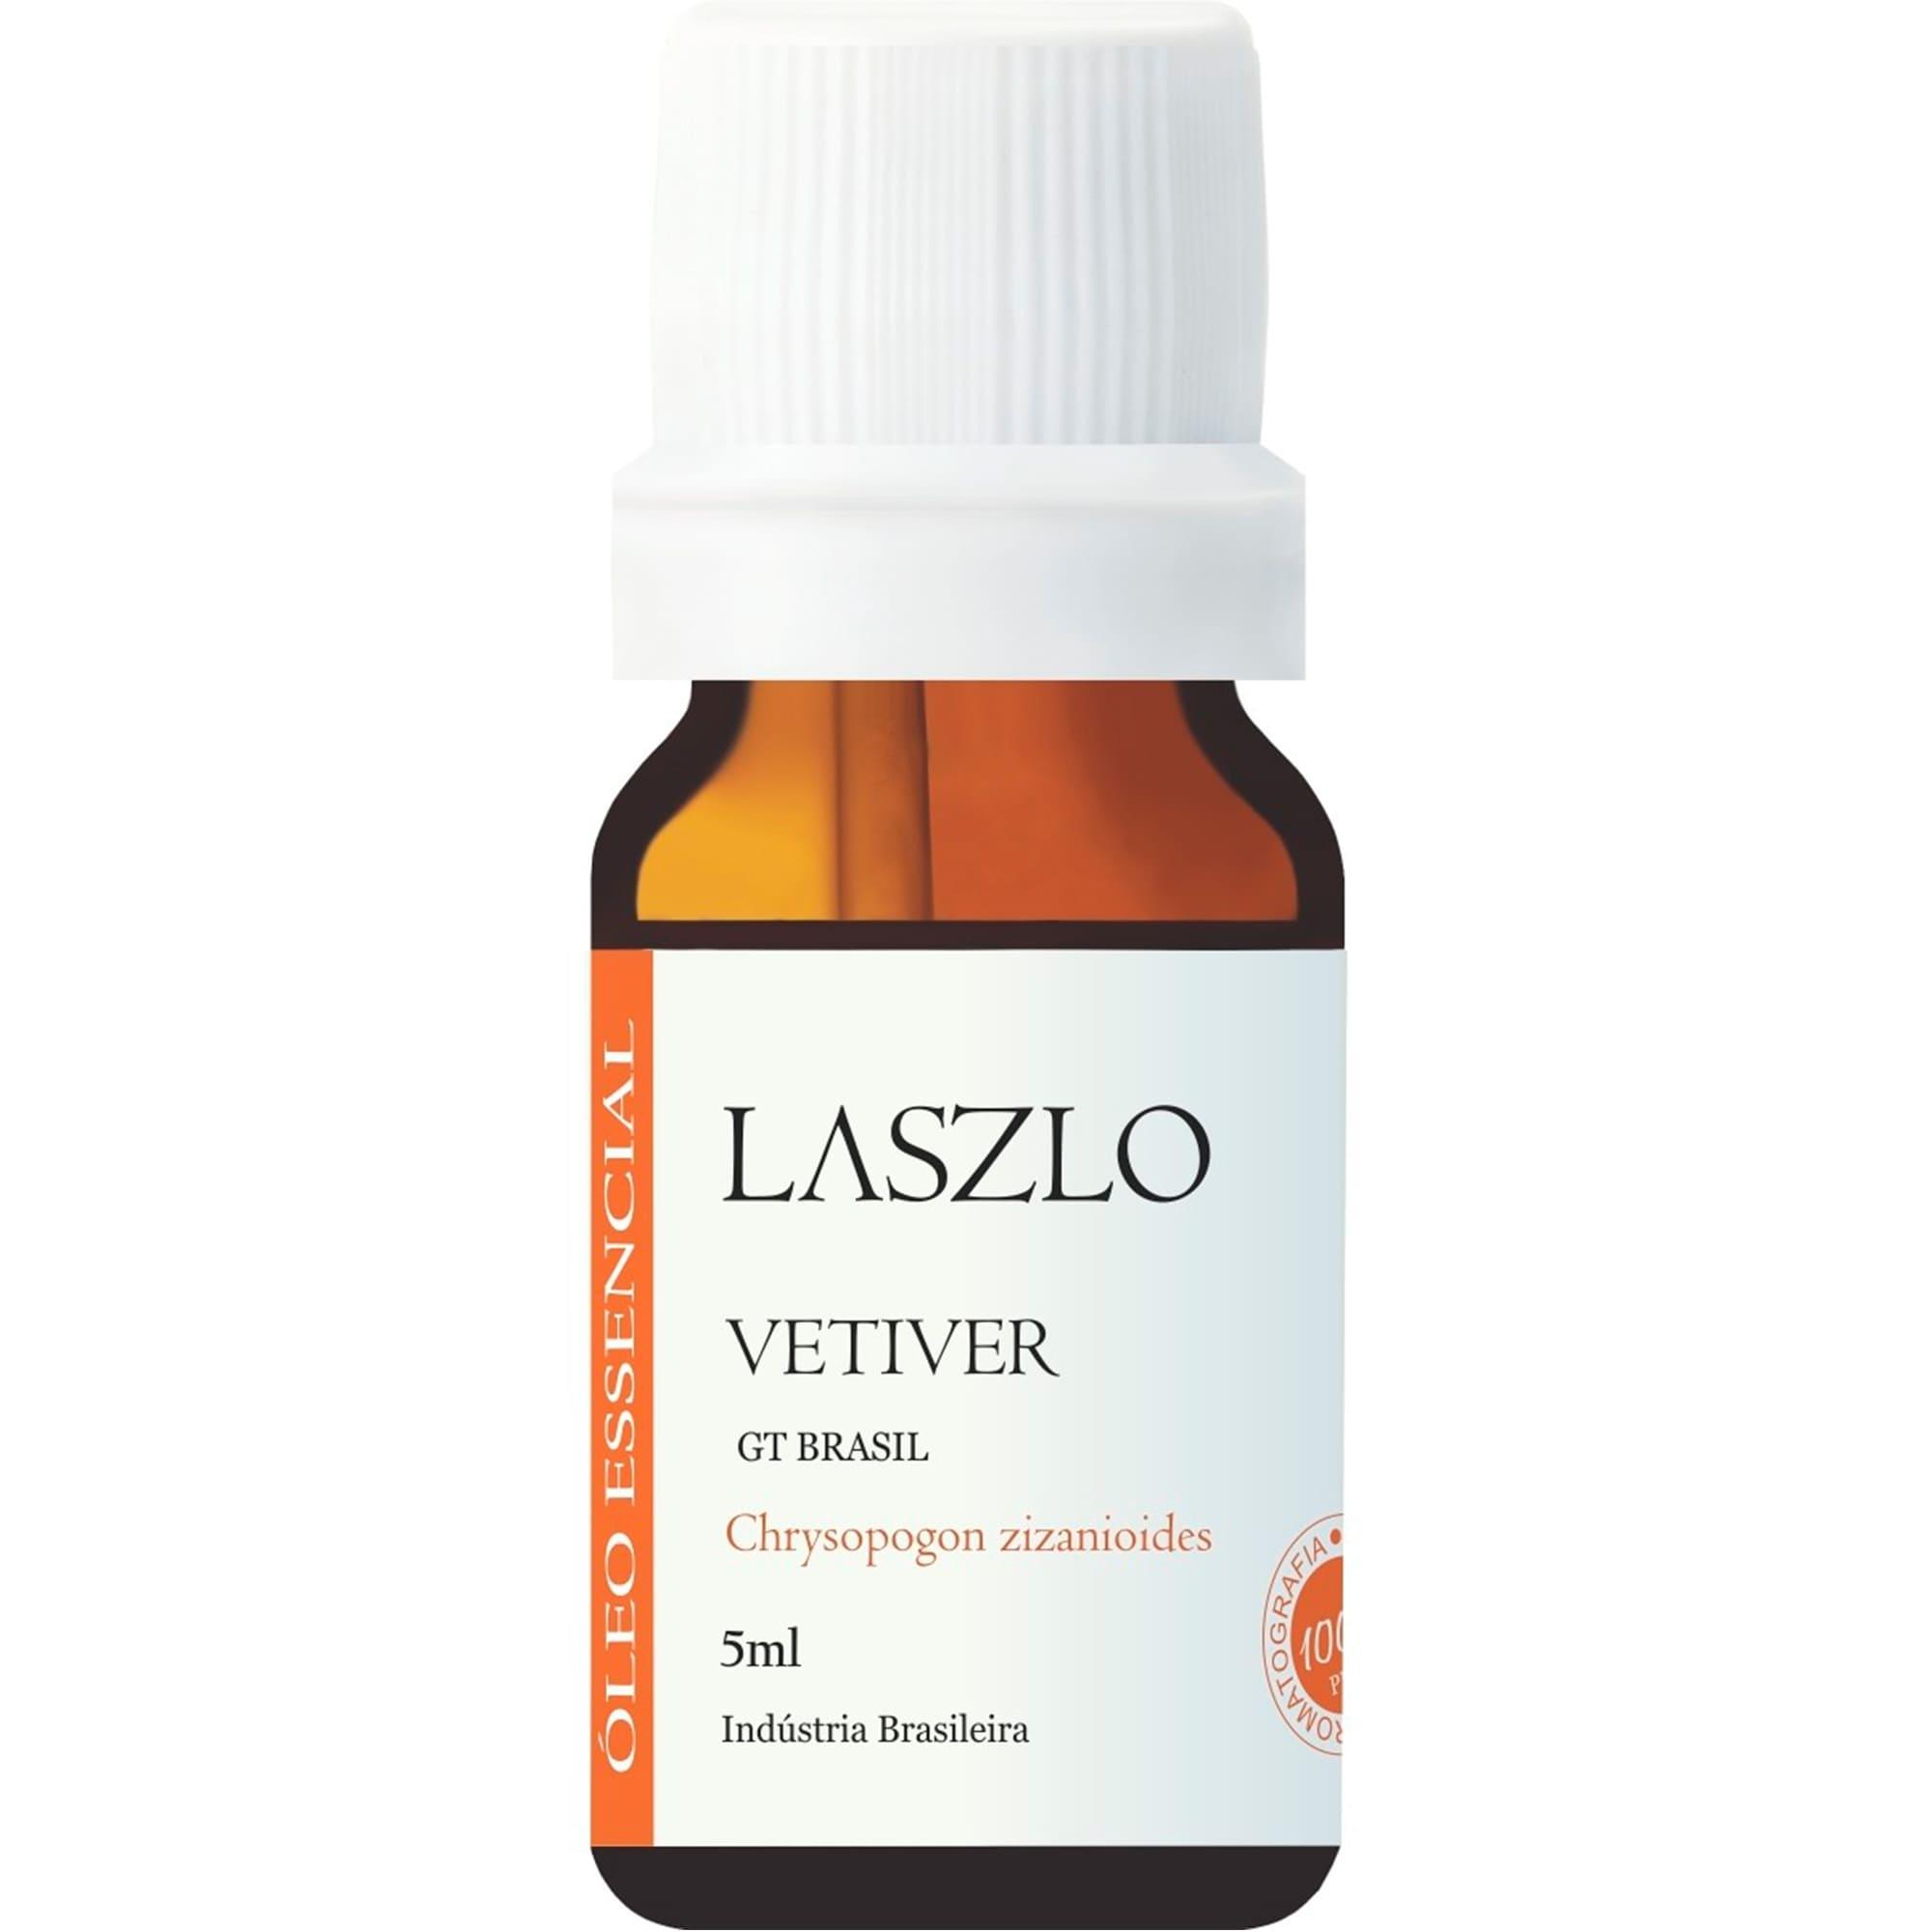 Óleo Essencial de Vetiver (GT Brasil) 5ml - Laszlo